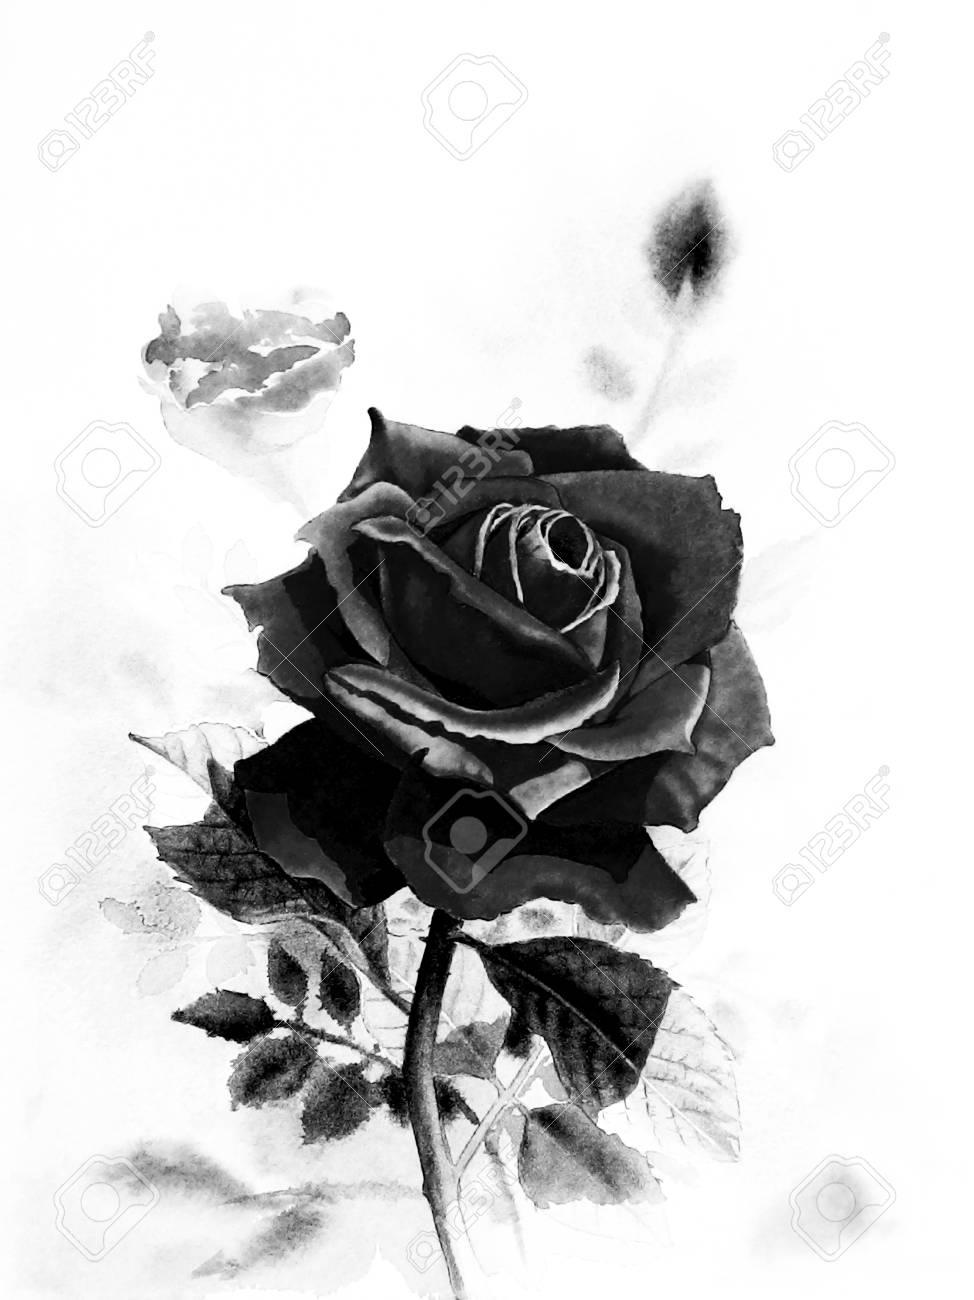 Watercolor Original Realistic Painting Black Color Of Rose Flower